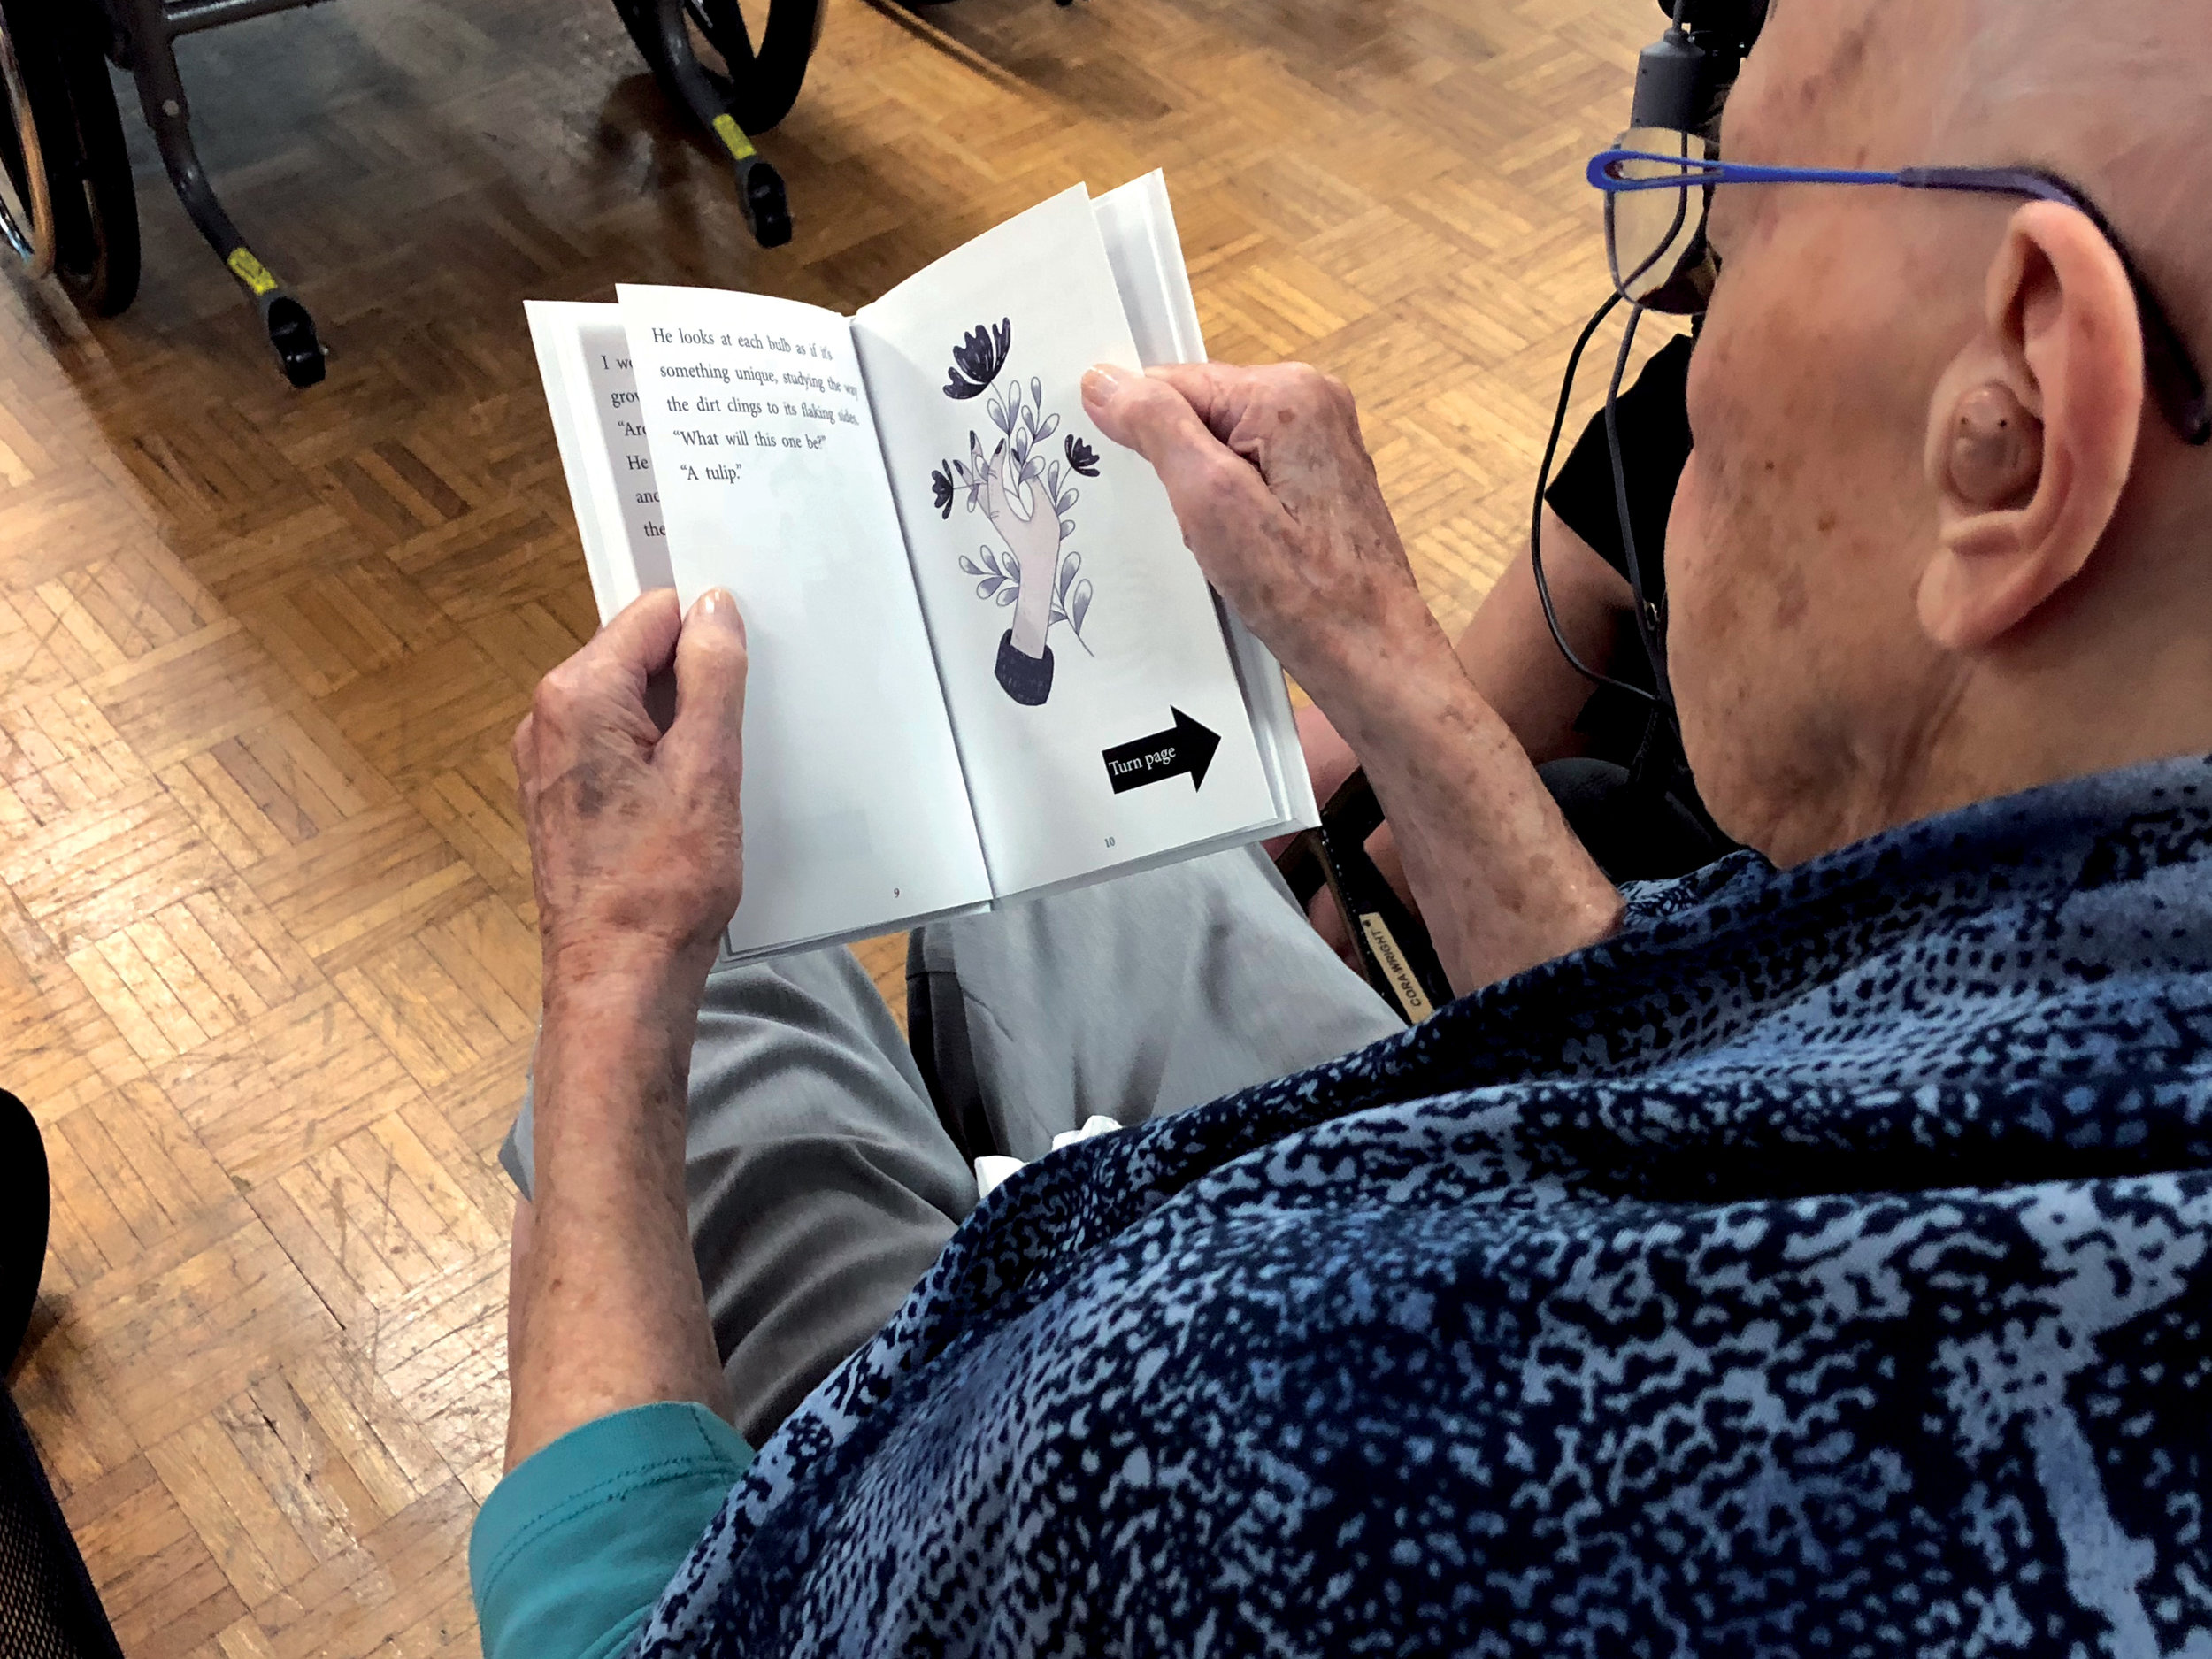 Photo courtesy Marlena Books.